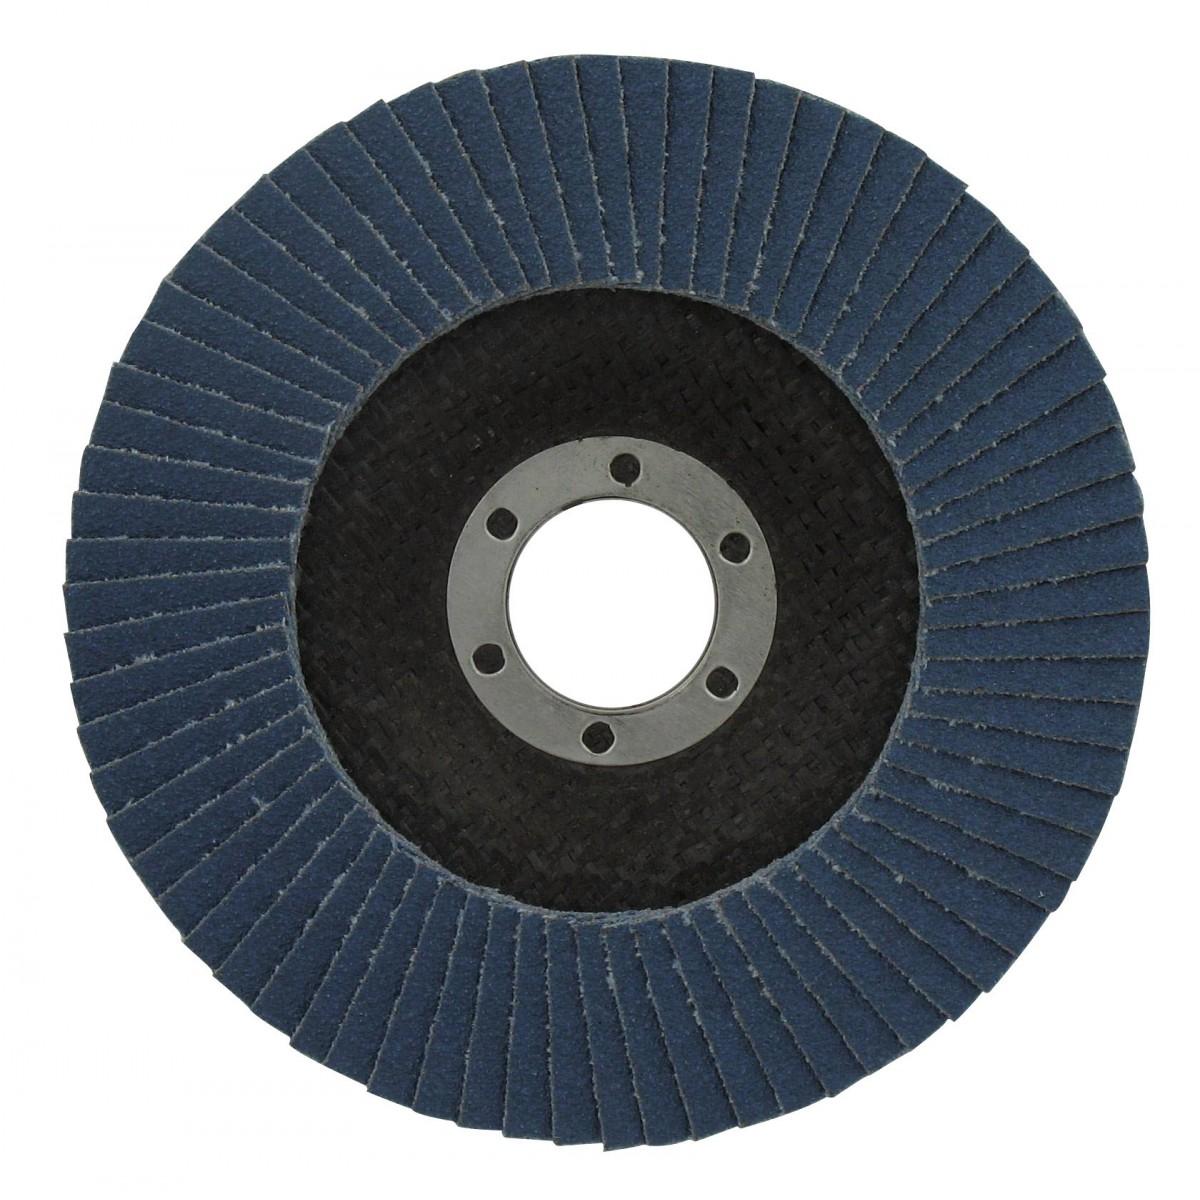 Disque zirconium standard SCID - Grain 60 - Diamètre 115 mm - Vendu par 1